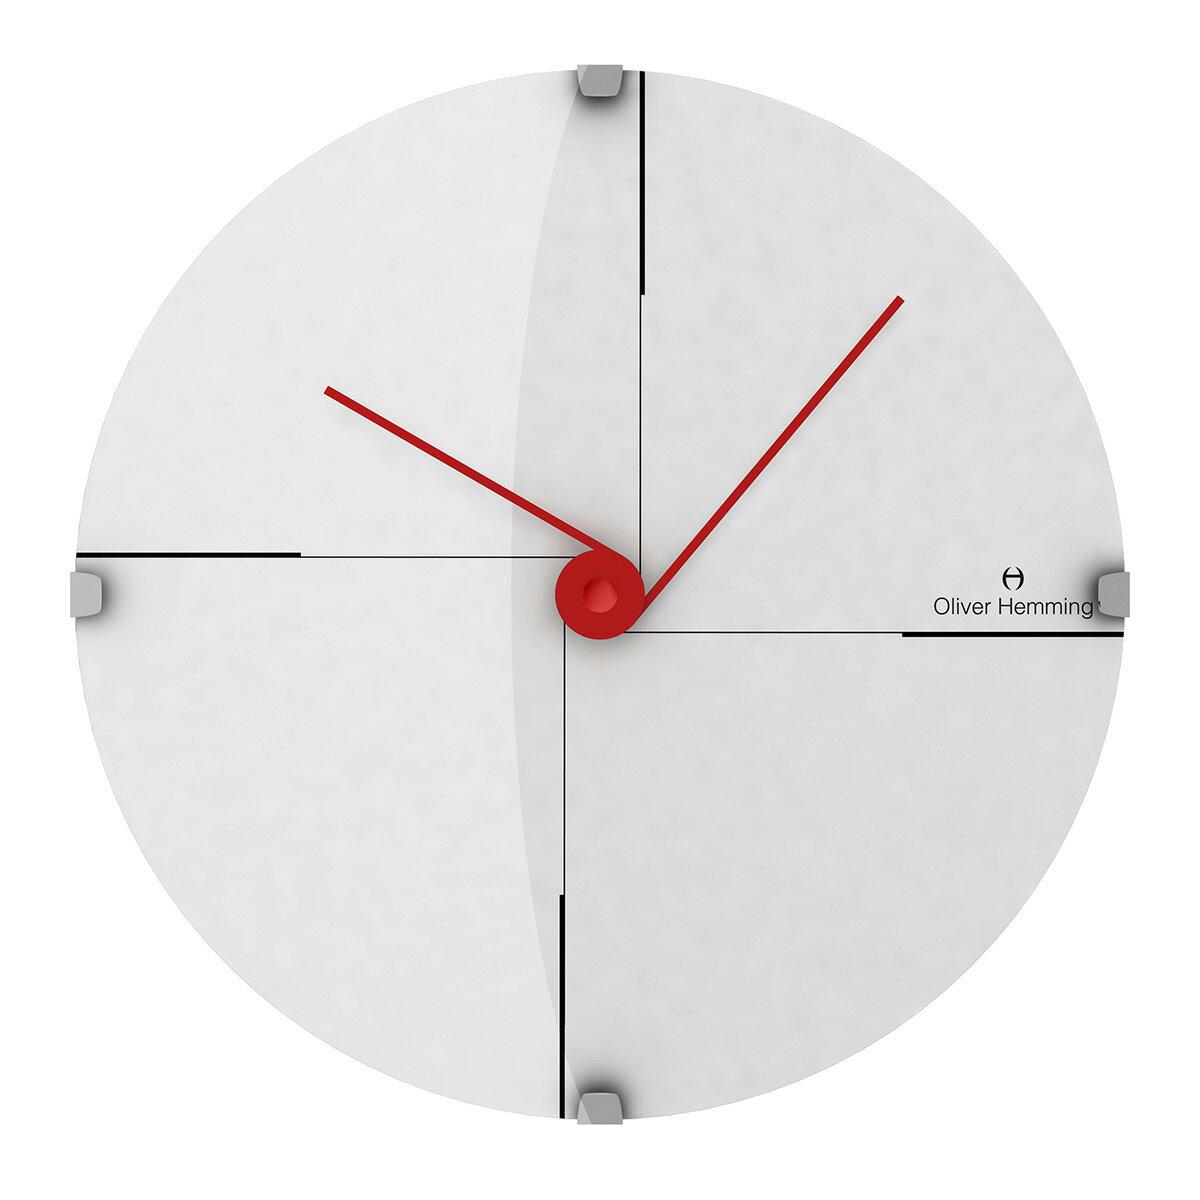 Oliver Hemming オリバーヘミング 壁掛け時計 インテリア 北欧 Vitri Domed Glass ヴィトリドームガラス 300mm [W300DG9W] 正規品